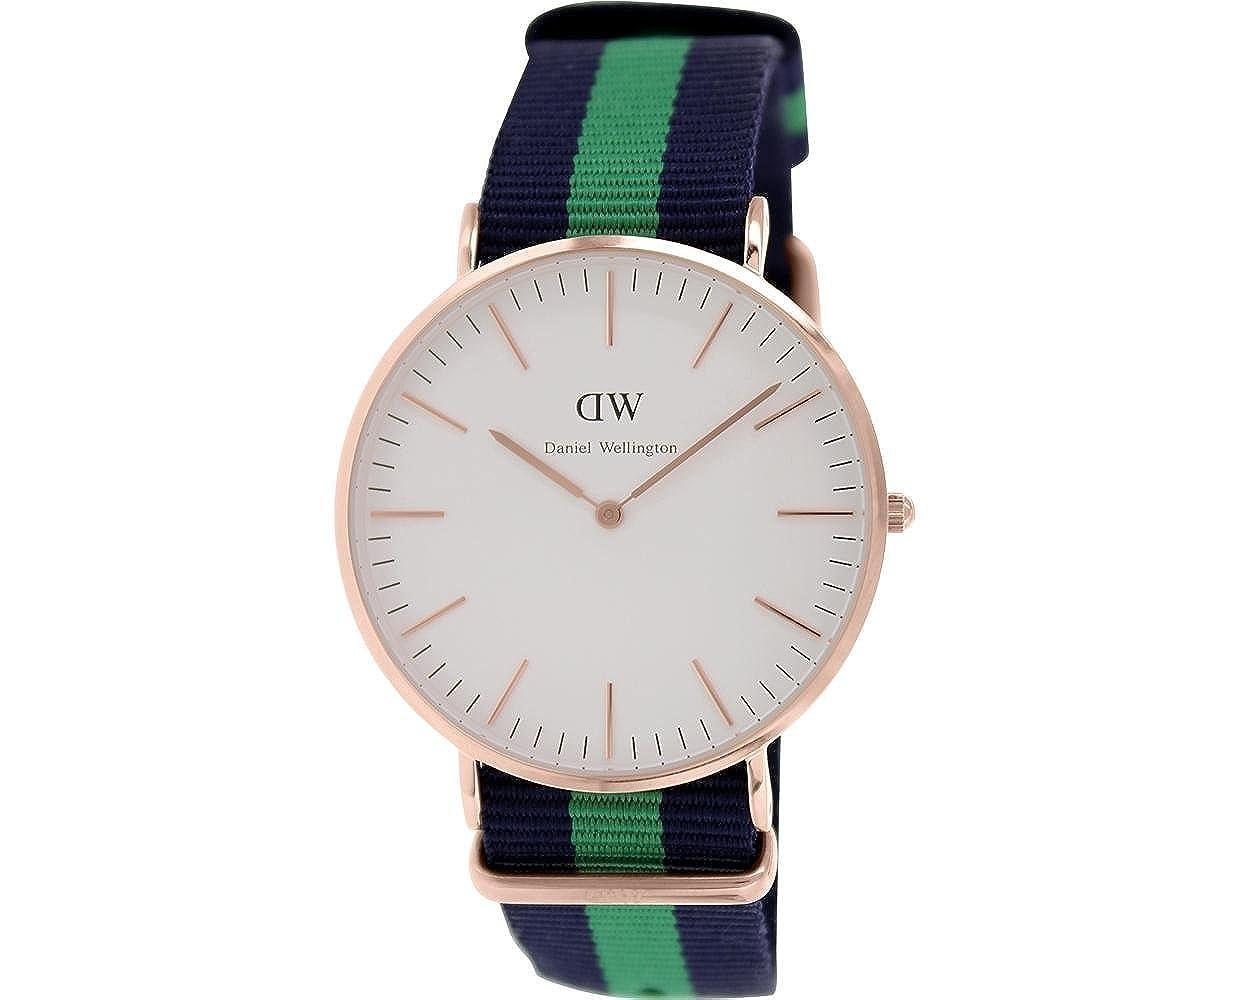 Daniel Wellington Reloj con Movimiento Miyota Man Warwick 41 mm: Amazon.es: Relojes